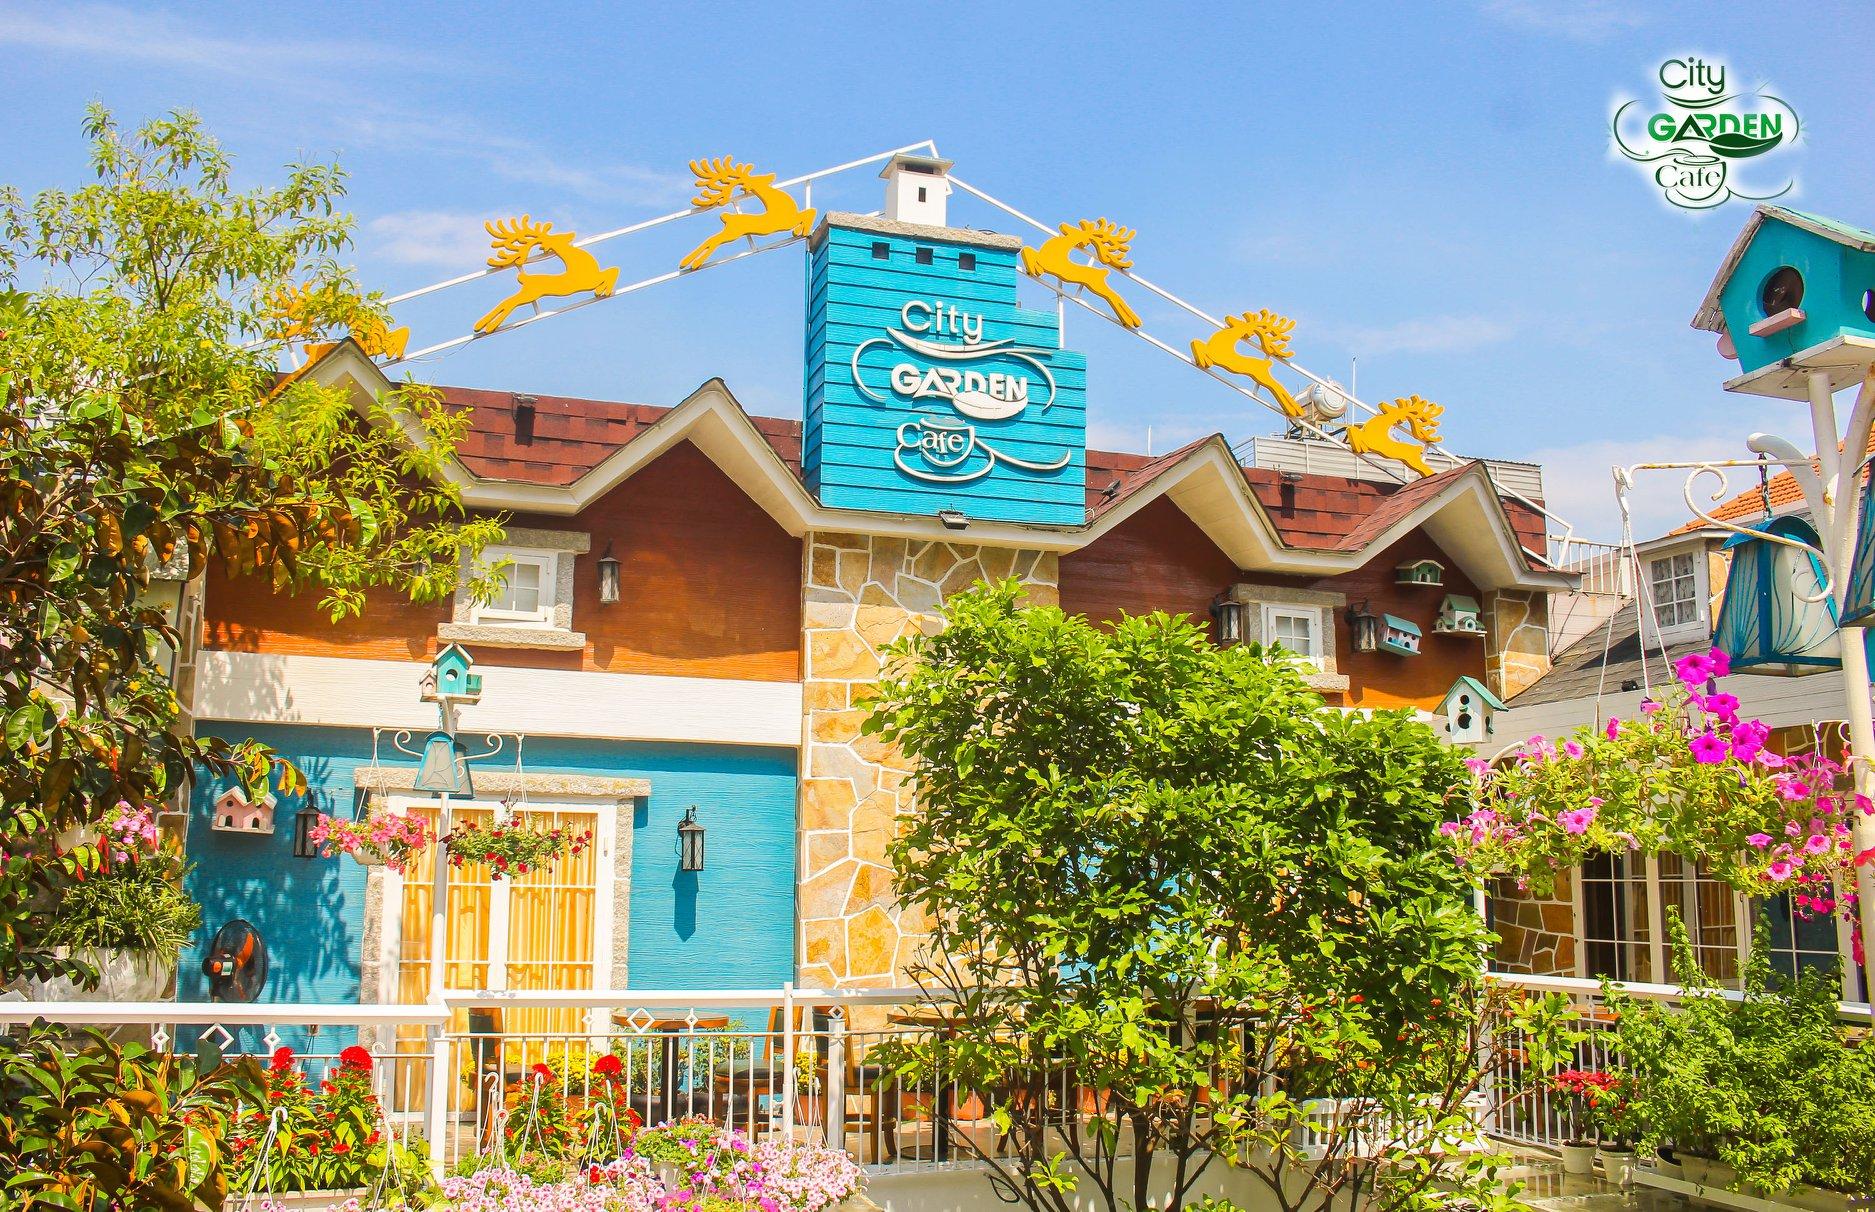 toan canh City Garden Cafe 1